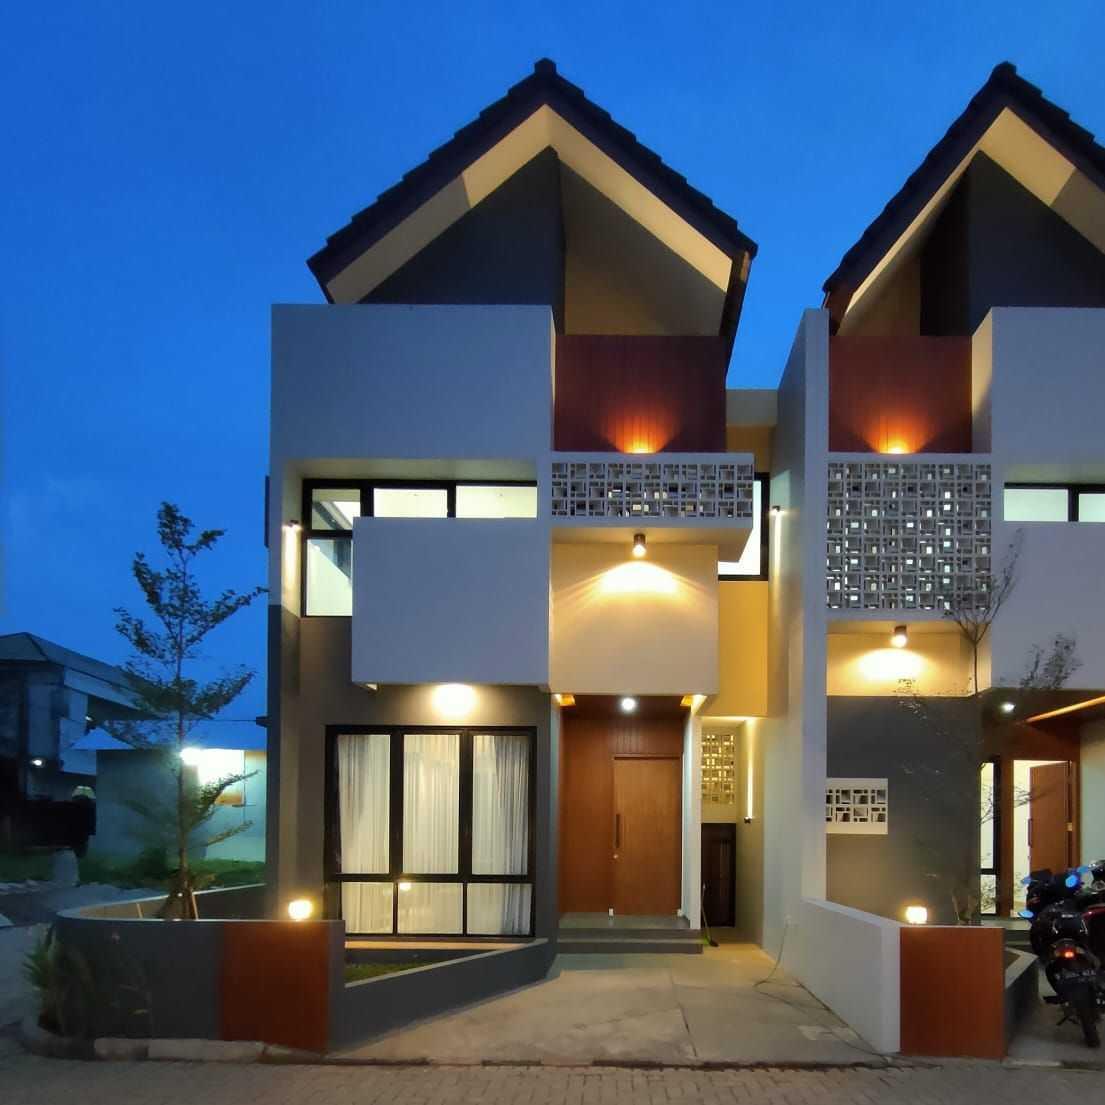 Arbatra Design Balboa Estate Bintaro Pd. Pucung, Kec. Pd. Aren, Kota Tangerang Selatan, Banten 15229, Indonesia Pd. Pucung, Kec. Pd. Aren, Kota Tangerang Selatan, Banten 15229, Indonesia Arbatra-Design-Balboa-Estate-Bintaro  121225